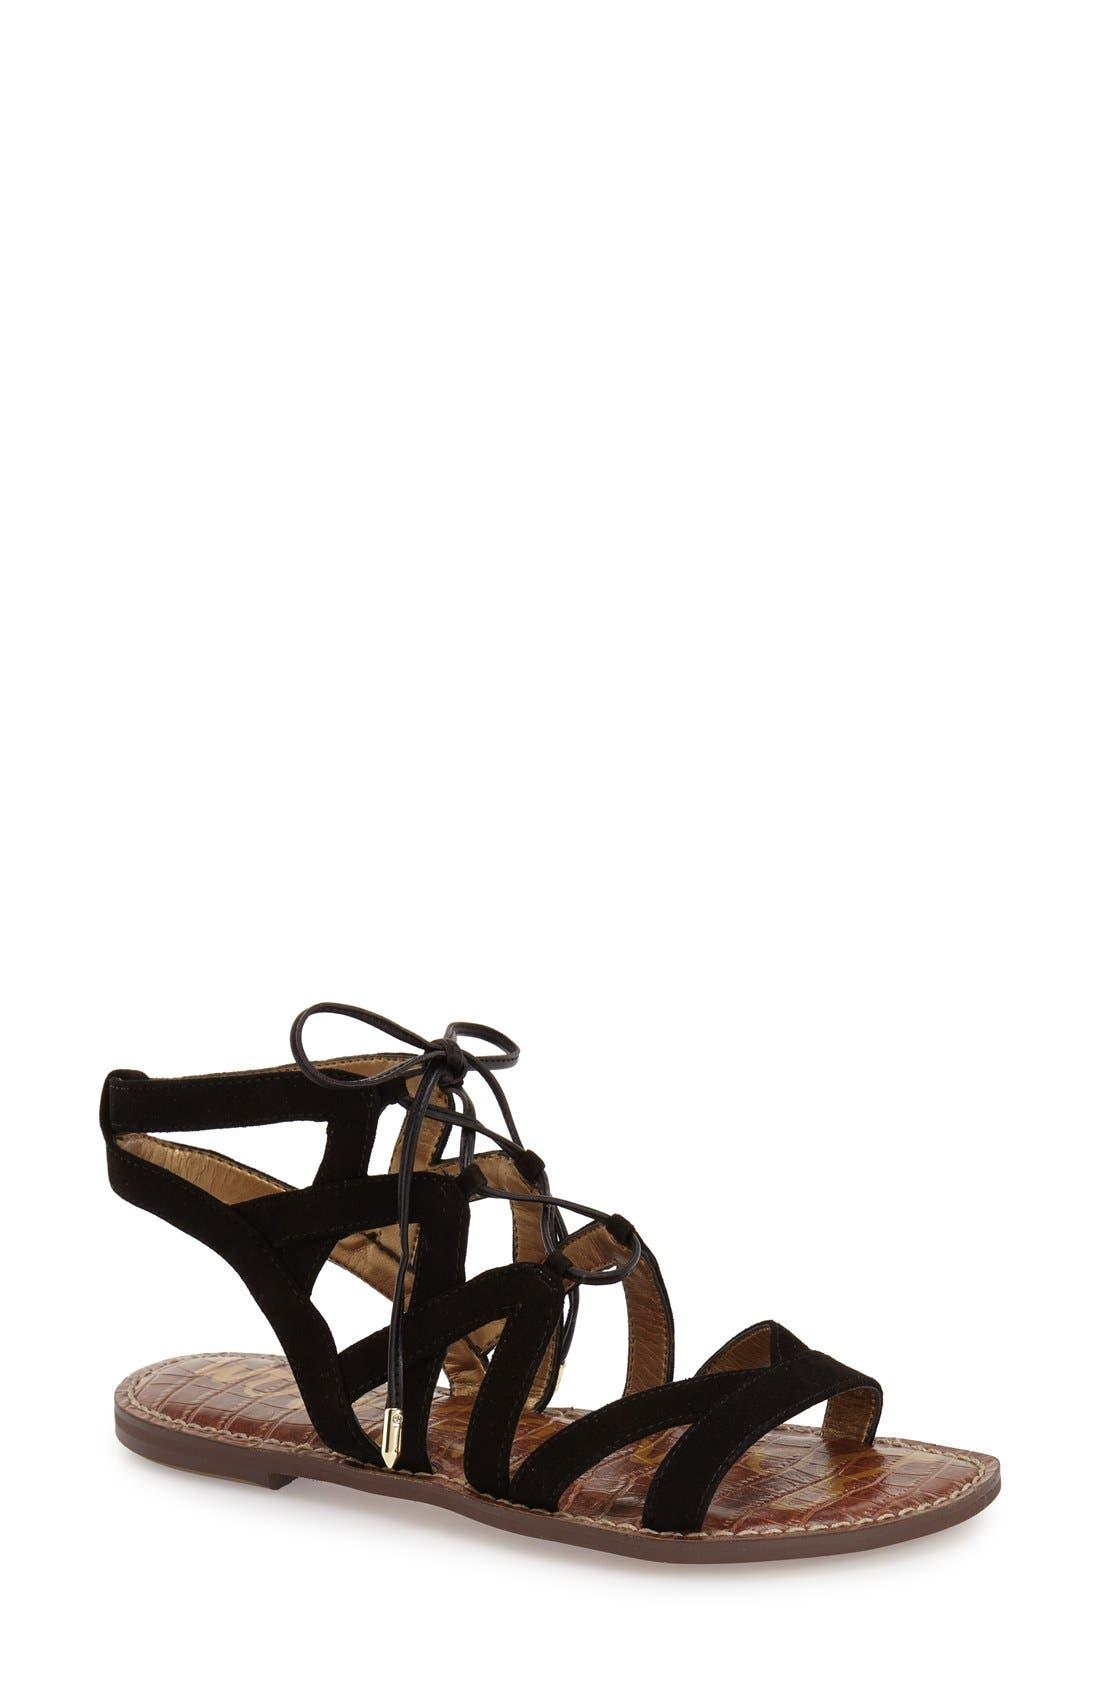 Alternate Image 1 Selected - Sam Edelman Gemma Lace-Up Sandal (Women)